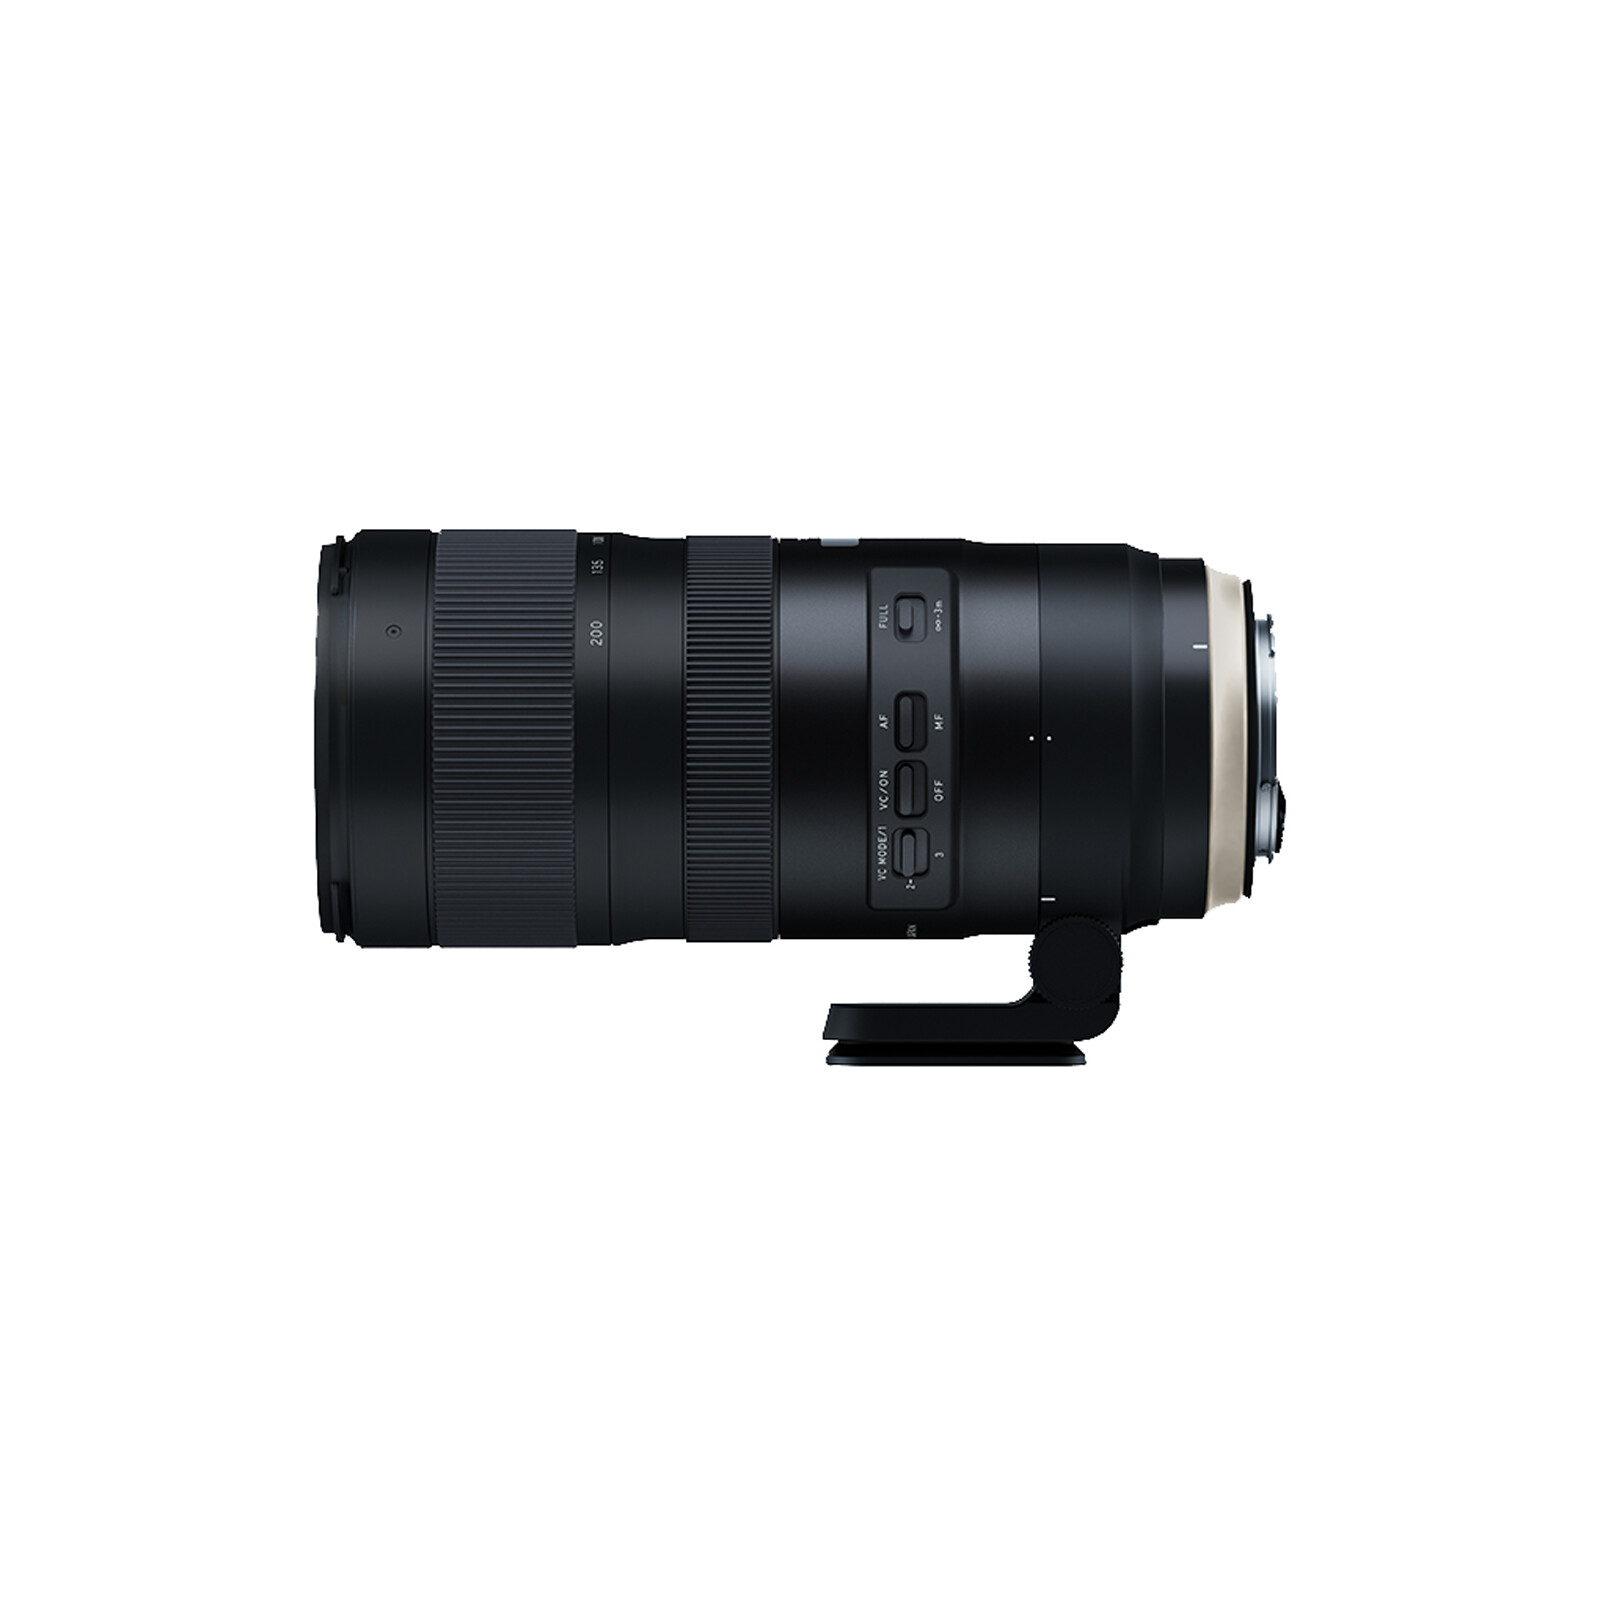 Tamron SP 70-200/2.8 Di VC USD G2 Nikon + UV Filter